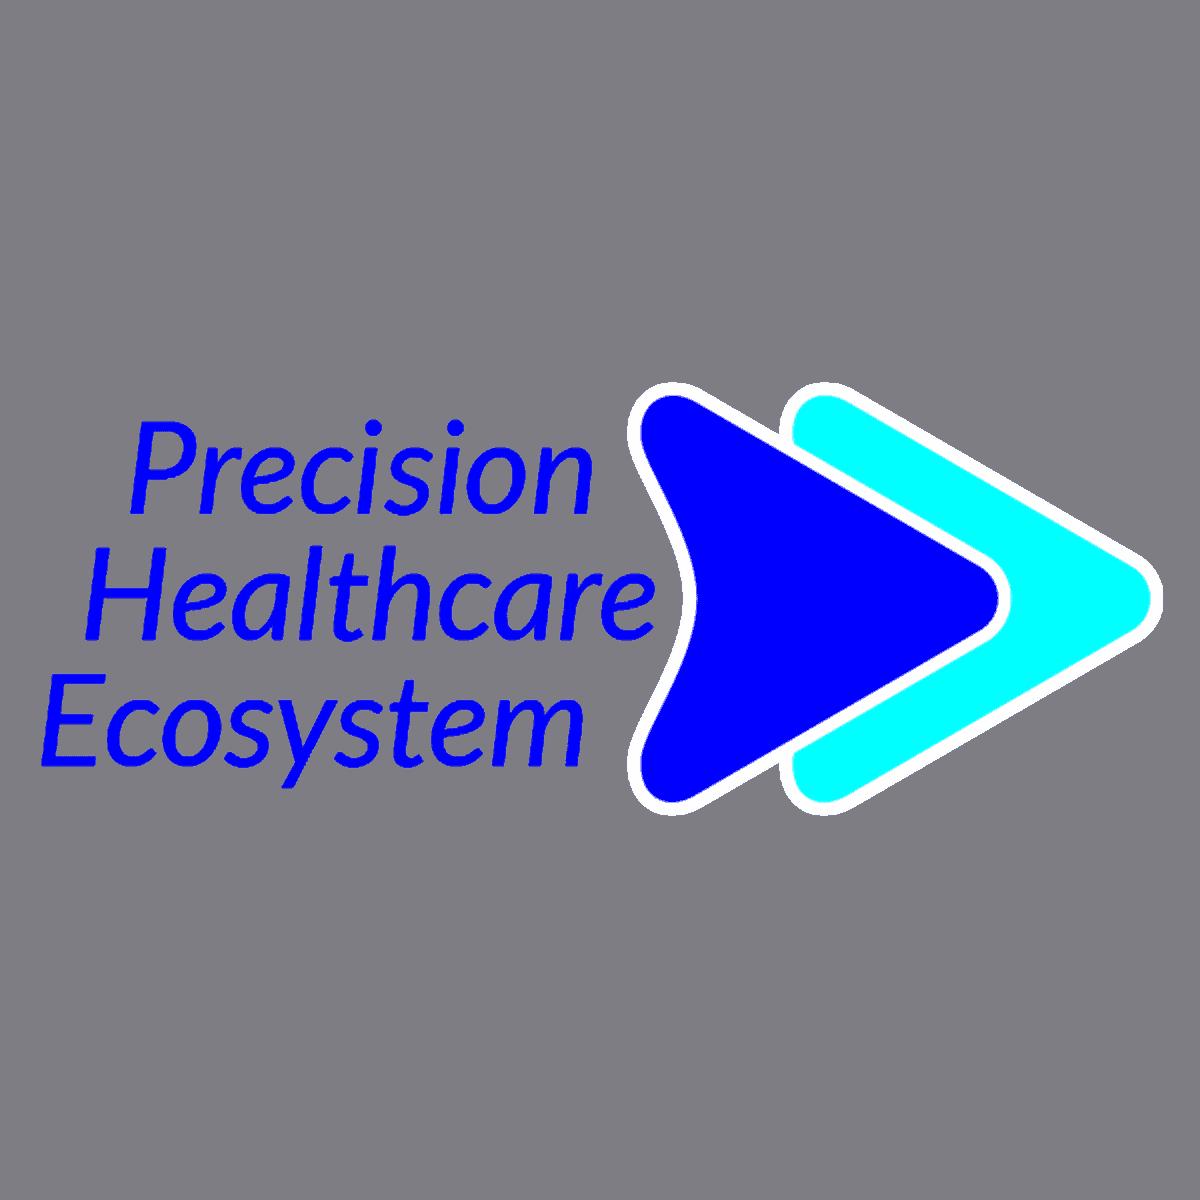 Precision Healthcare Ecosystem – Education